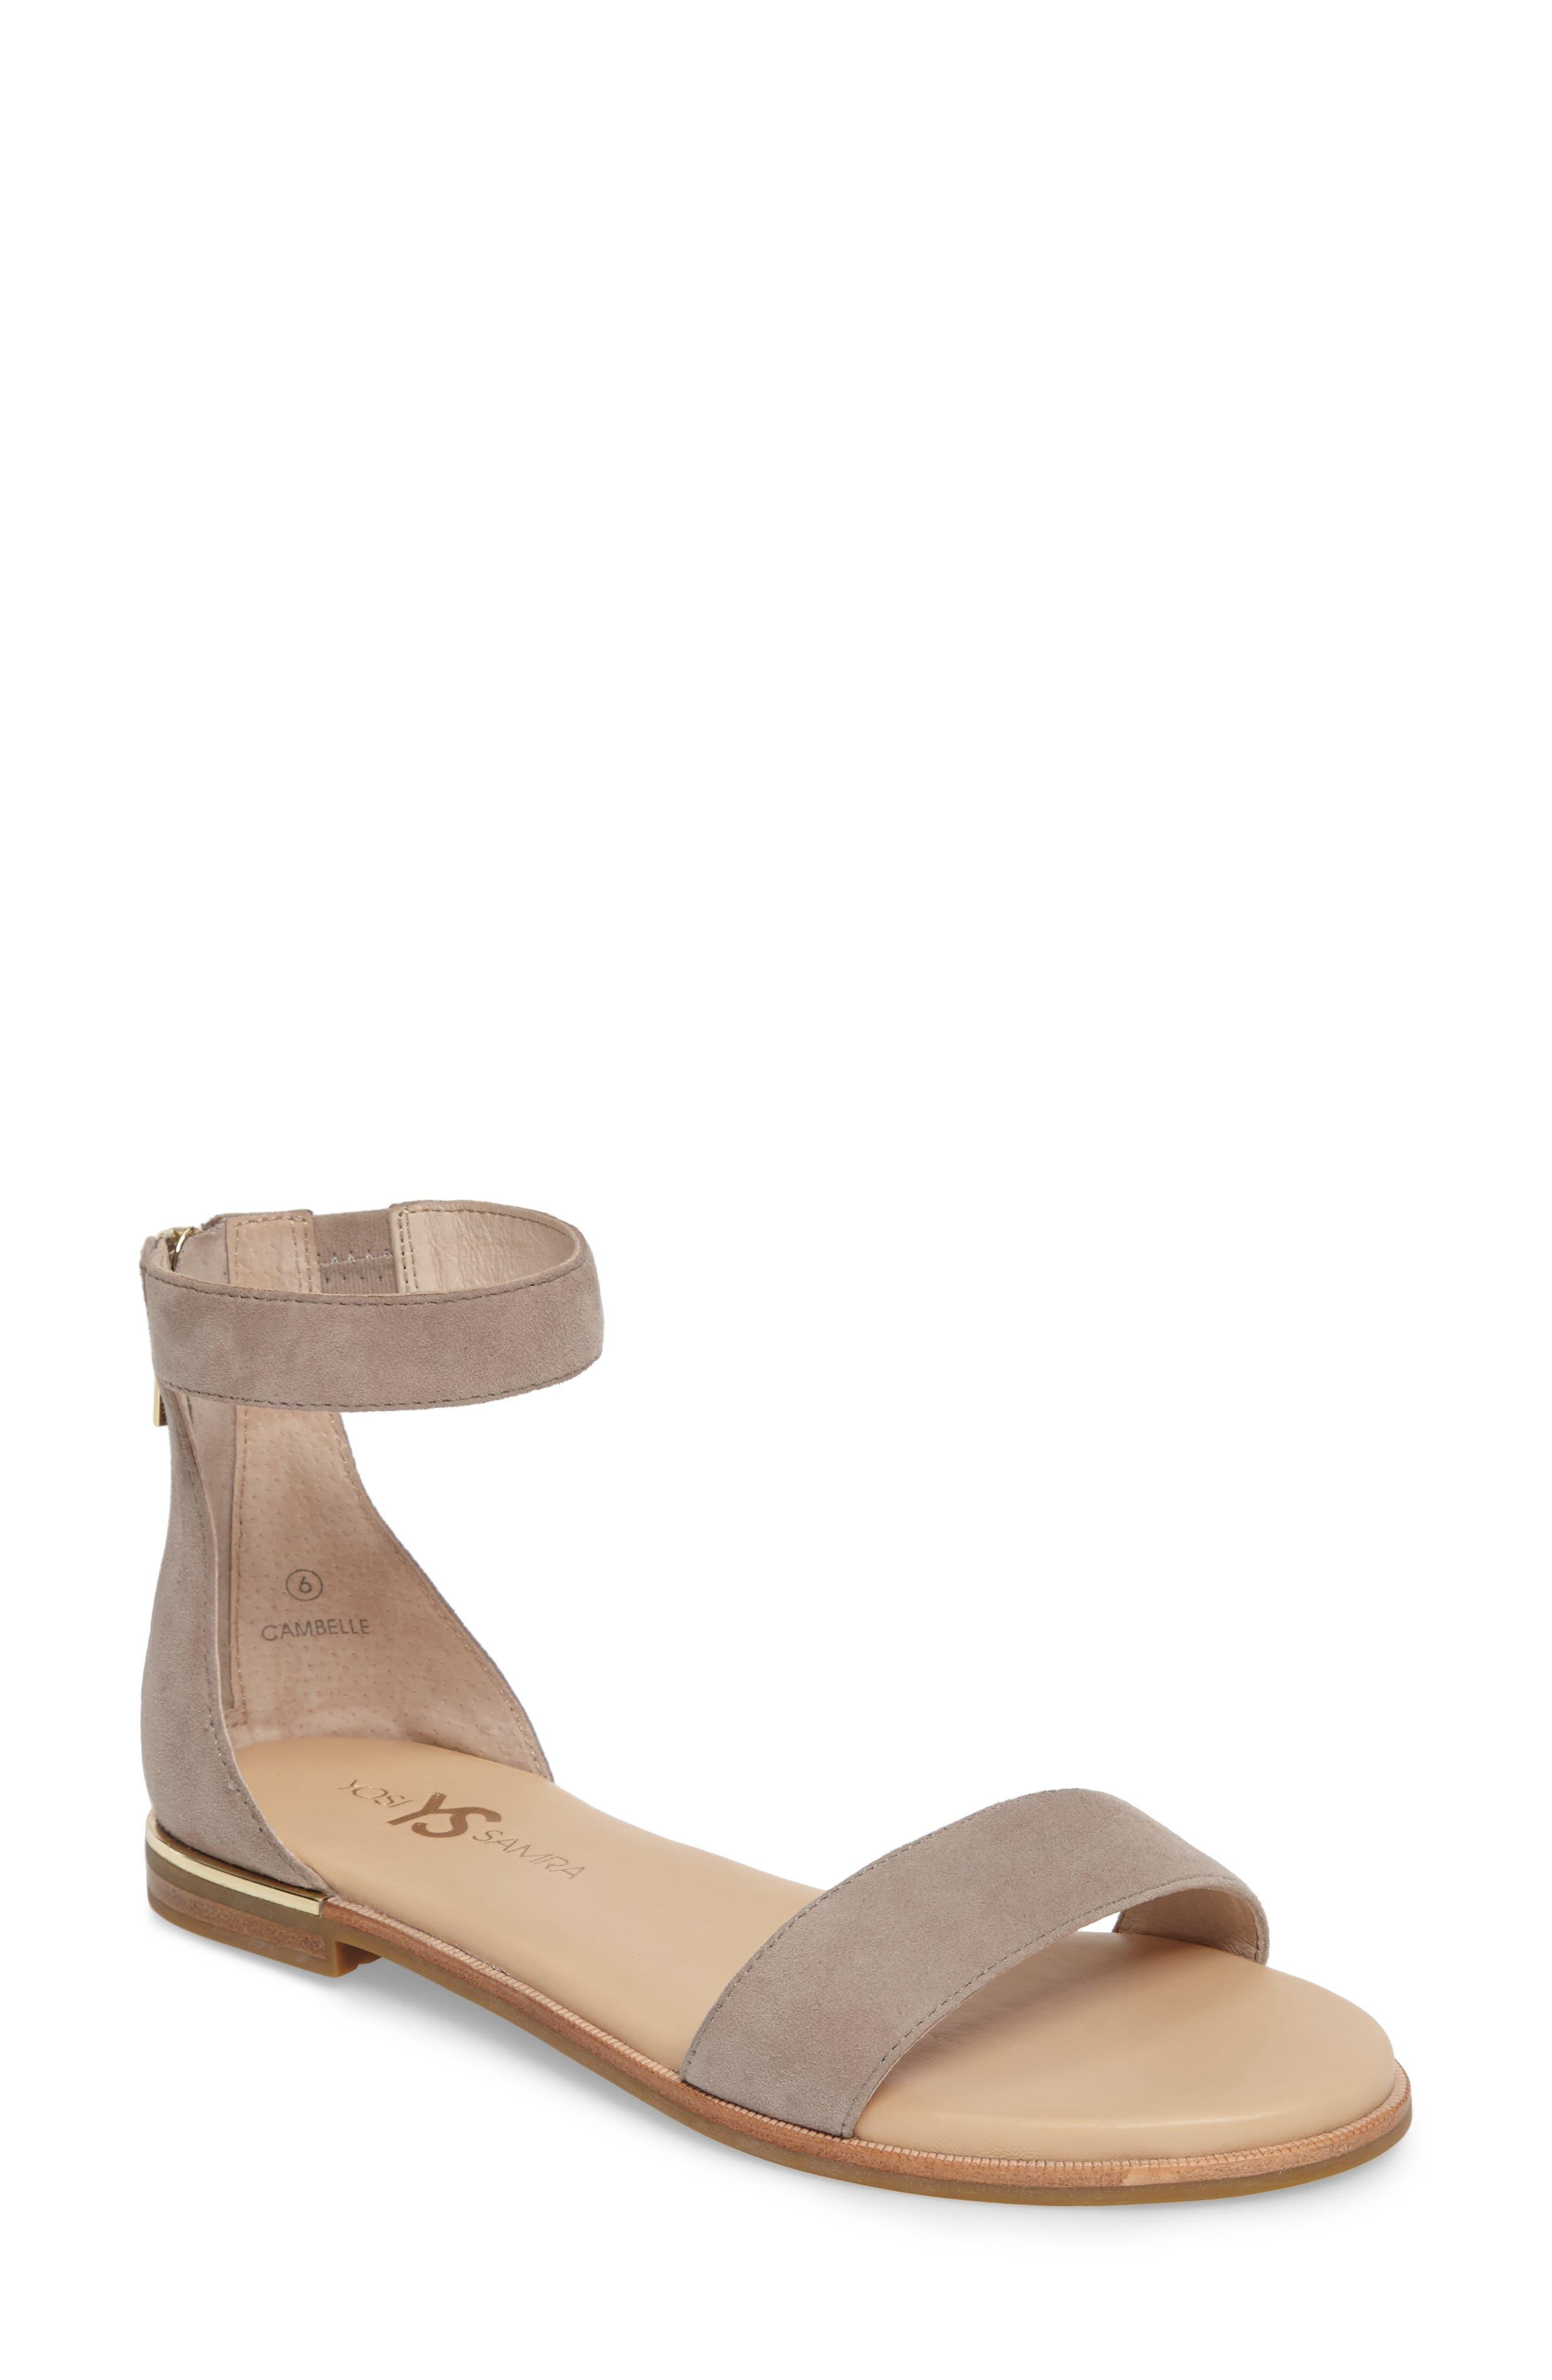 Alternate Image 1 Selected - Yosi Samra 'Cambelle' Ankle Strap Sandal